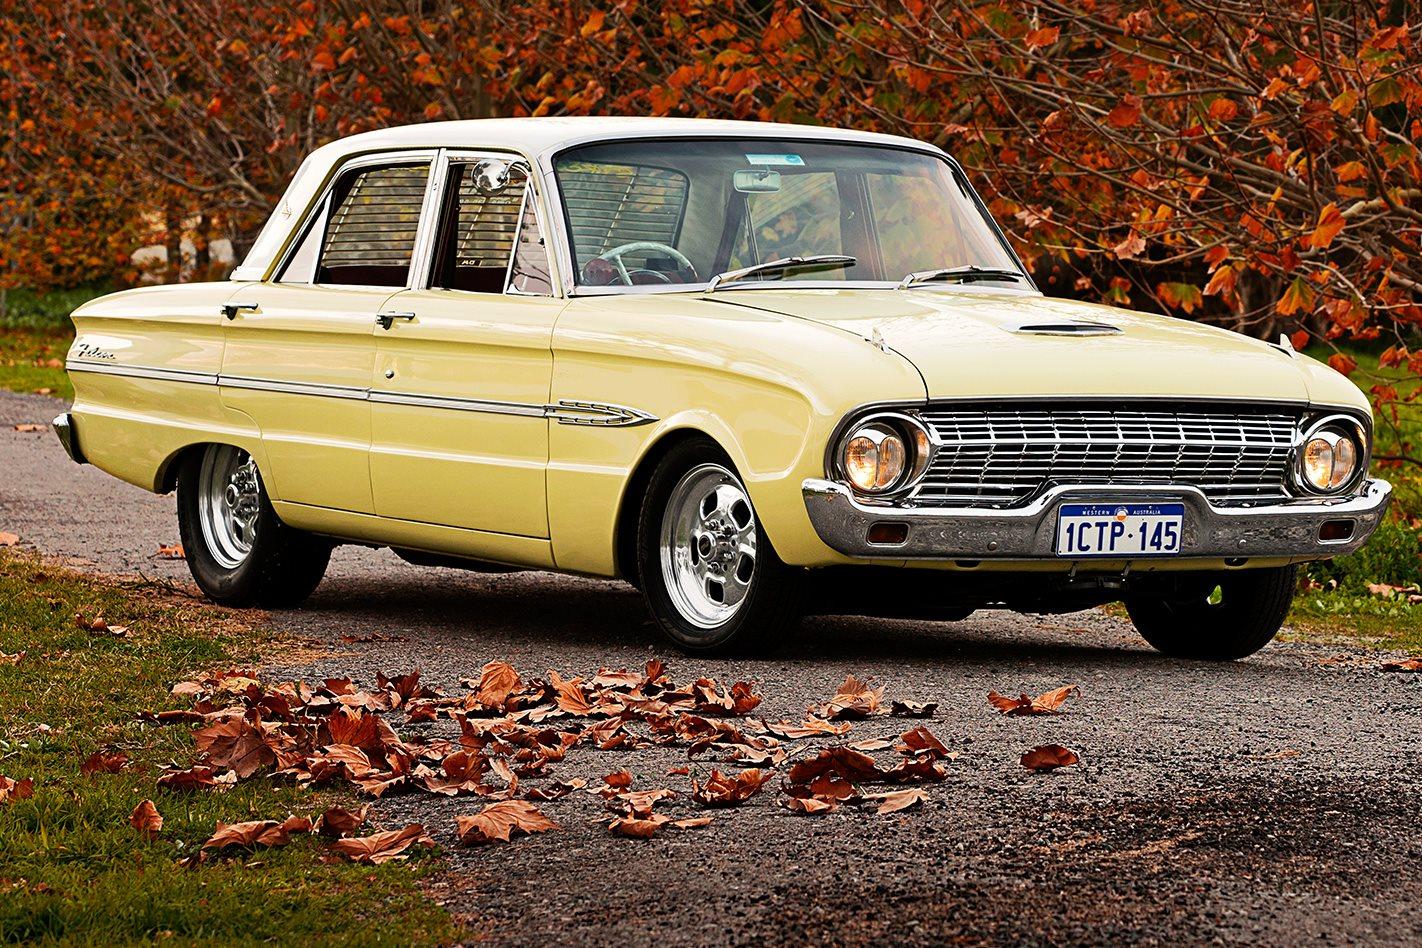 1963 FORD XL FUTURA front